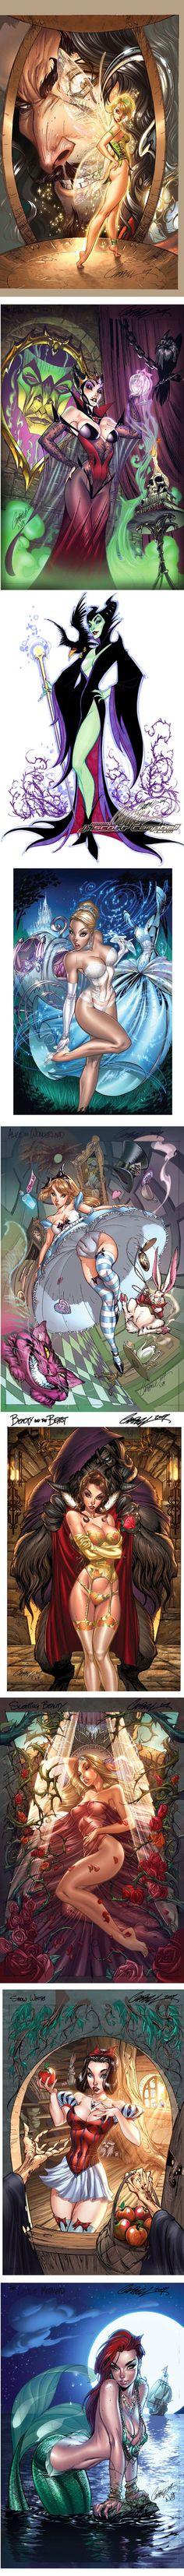 J. Scott Campbell Draws Naughty Disney Princesses